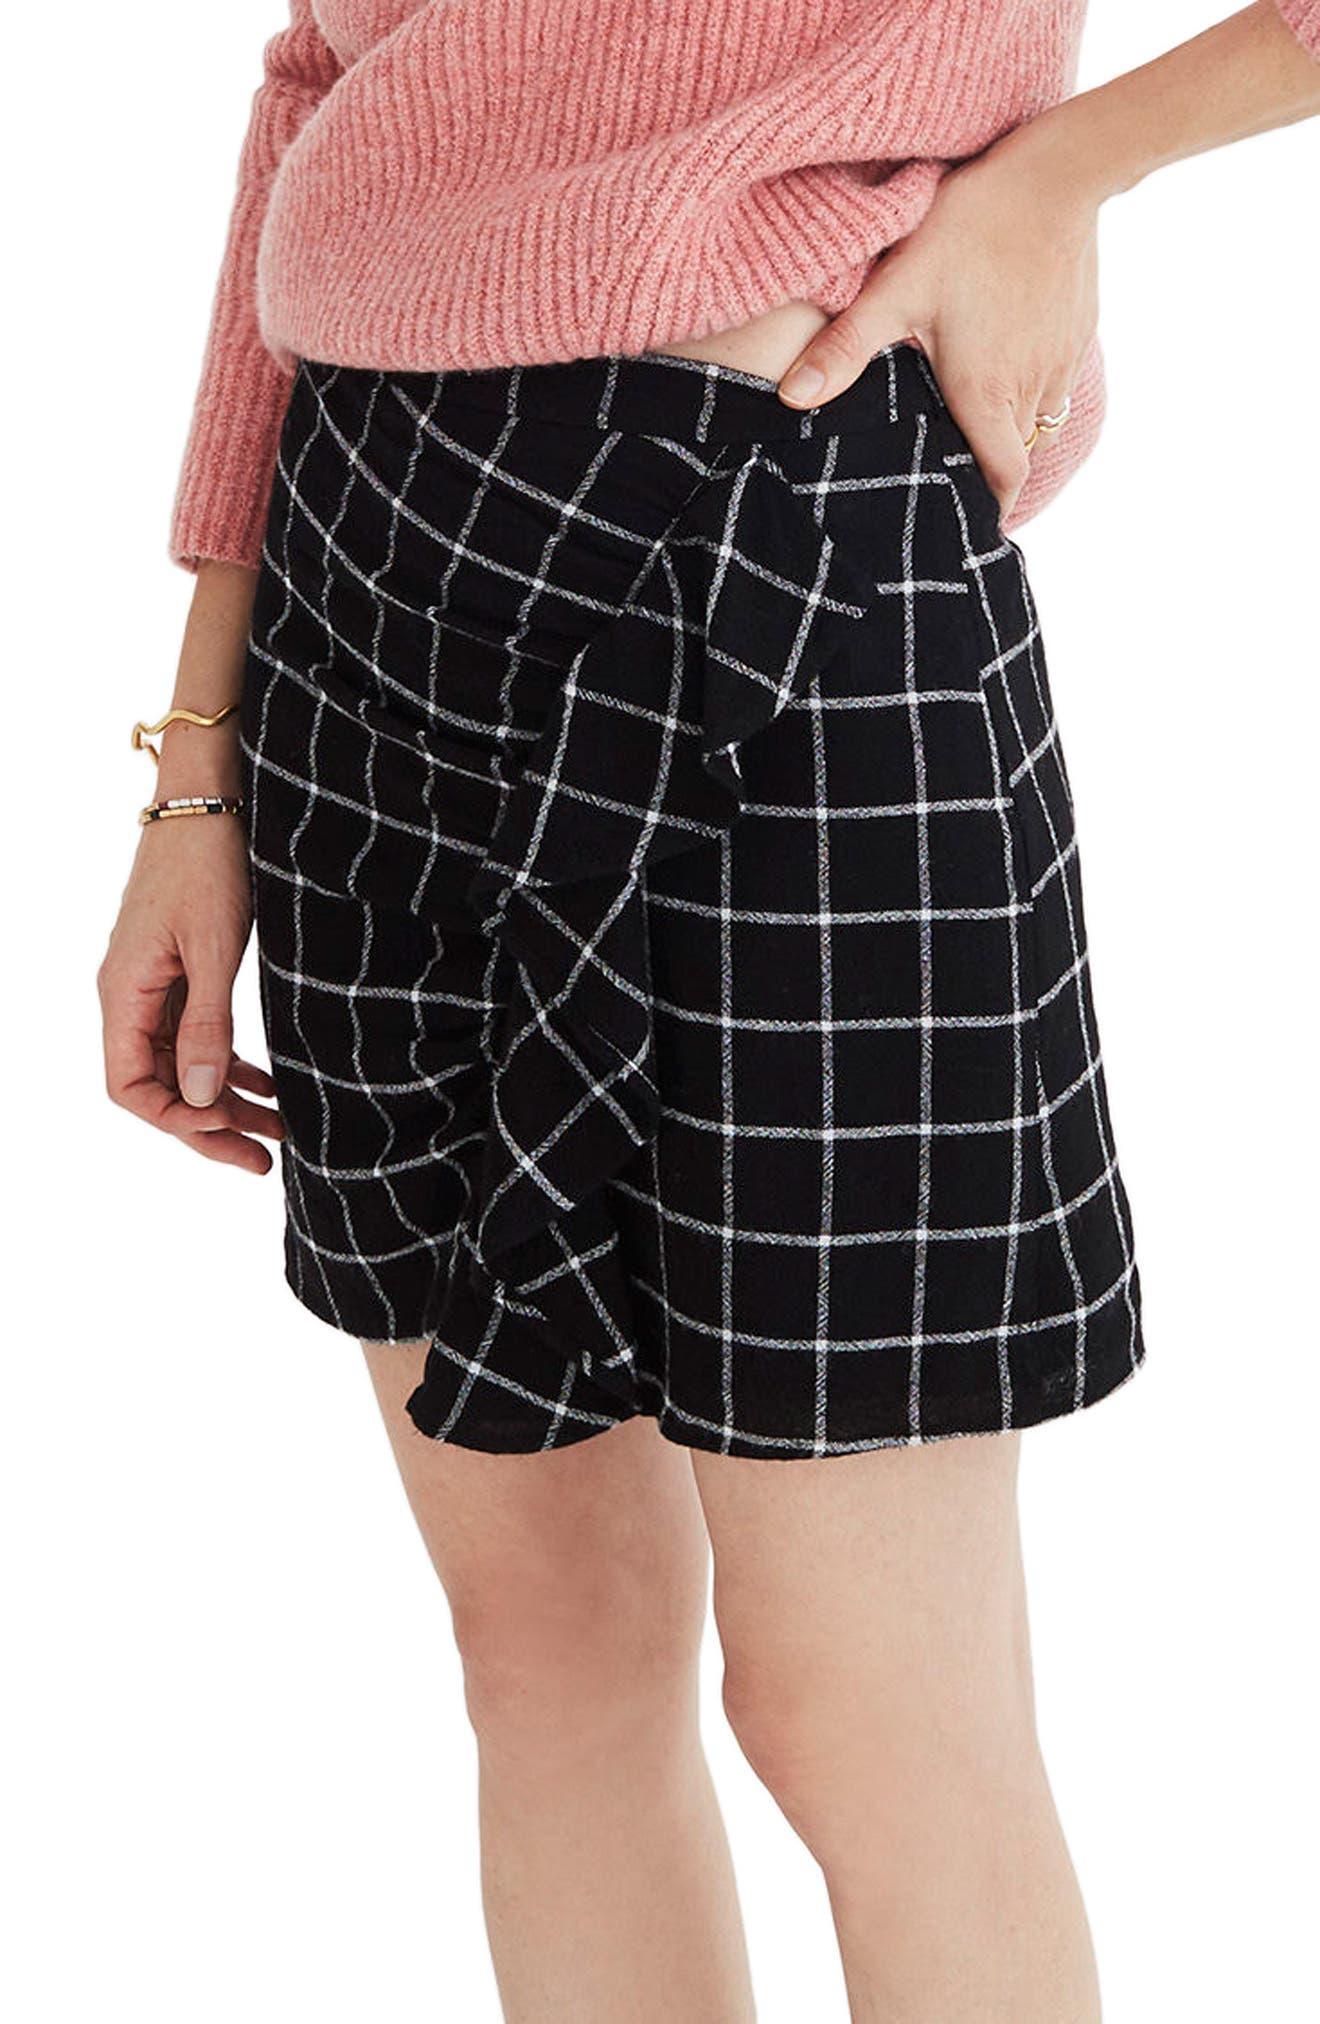 MADEWELL, Windowpane Ruffle Front Miniskirt, Main thumbnail 1, color, 009